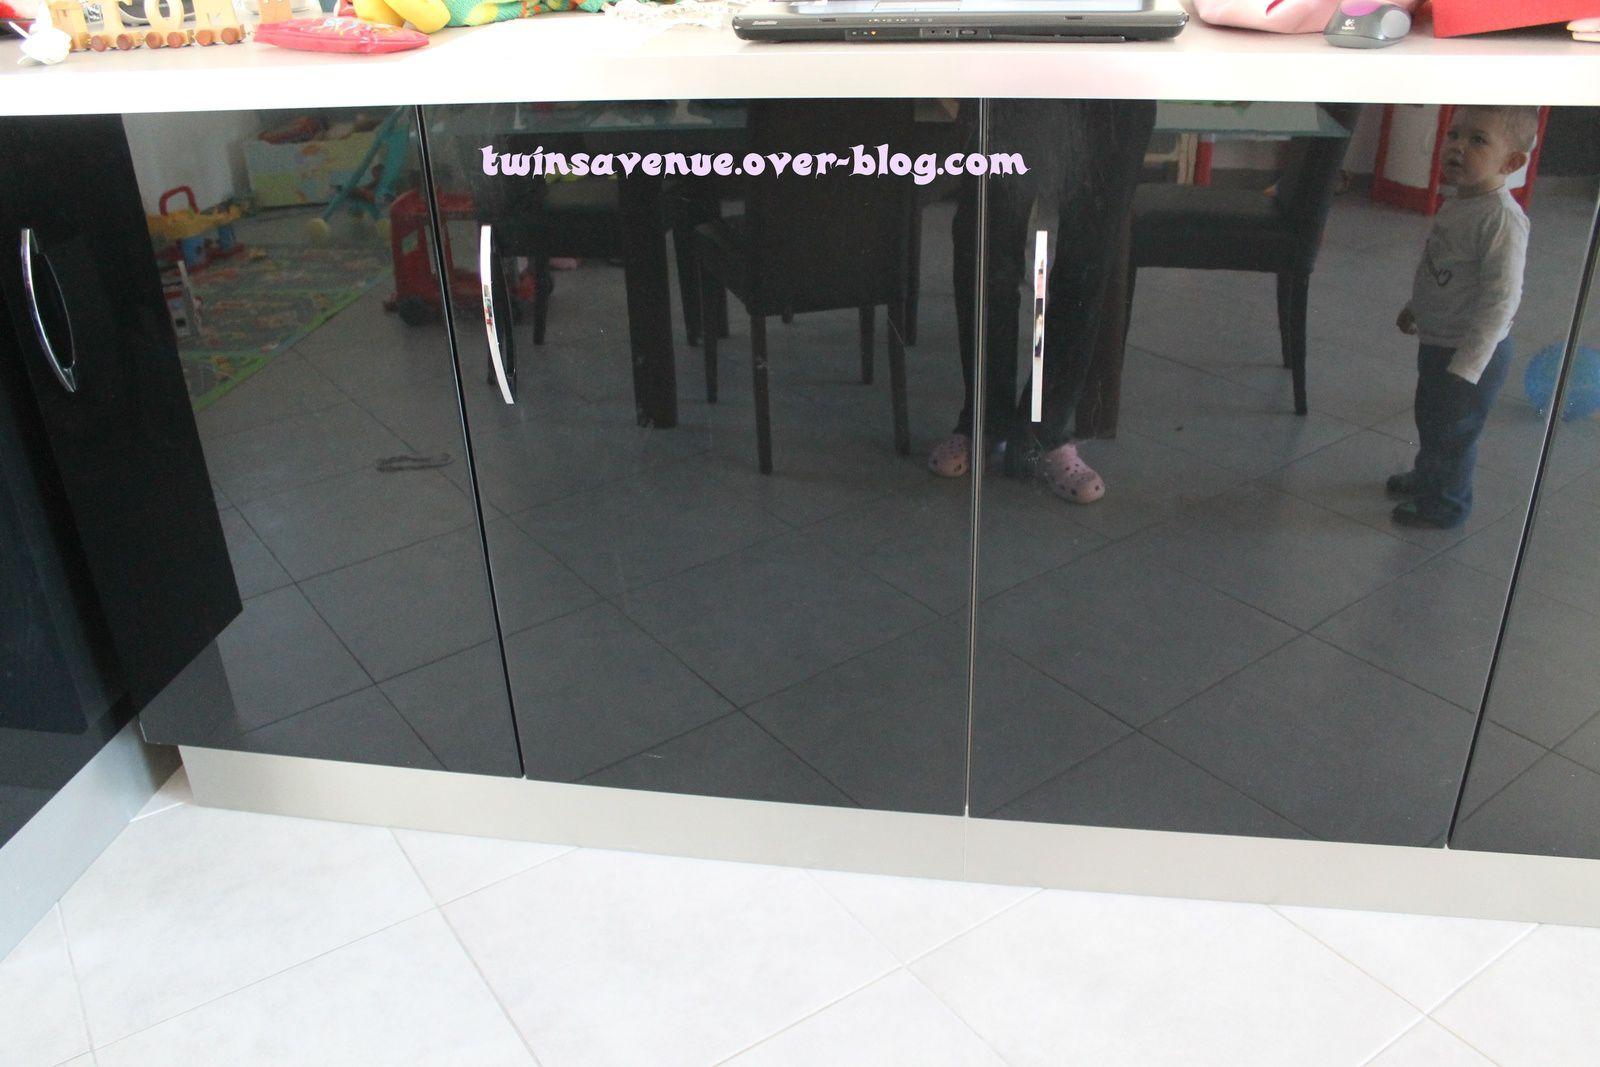 Les Bloques Portes Invisibles Twinsavenueoverblogcom - Bloc porte invisible